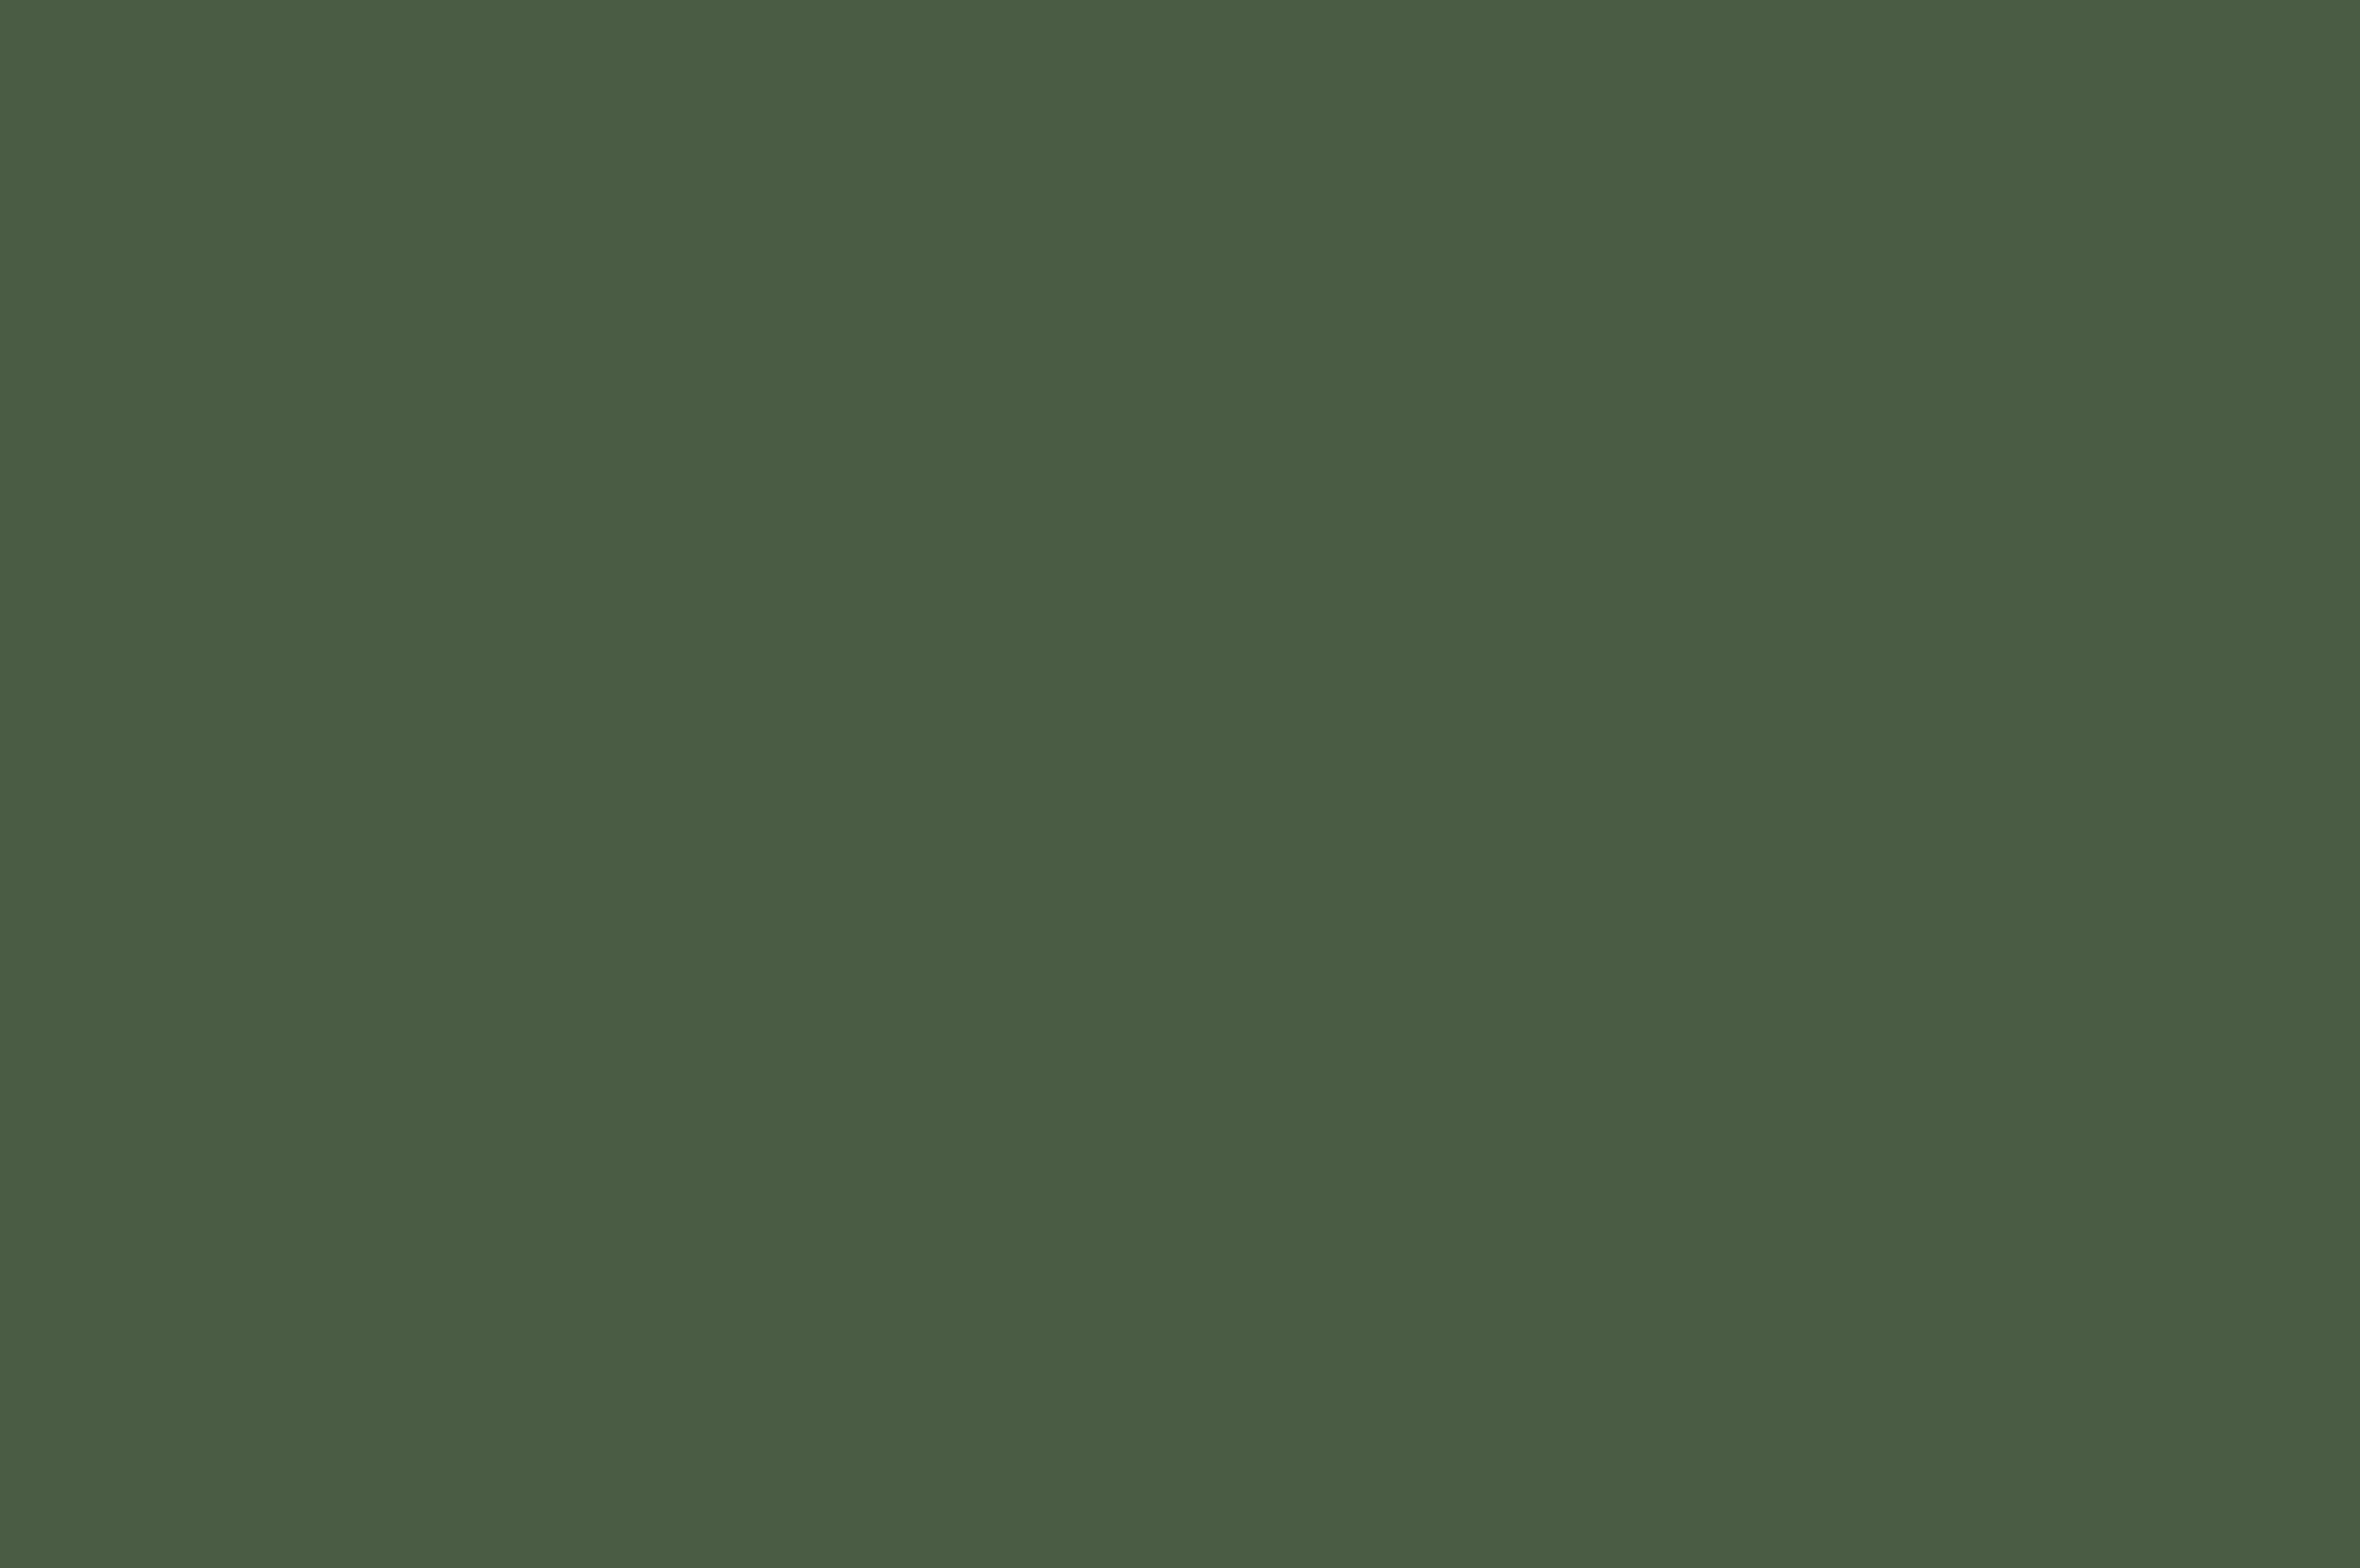 a68d93c7fef Extreem Beroemd Grijs Groen Kleur XY74 | Belbin.Info @WV19